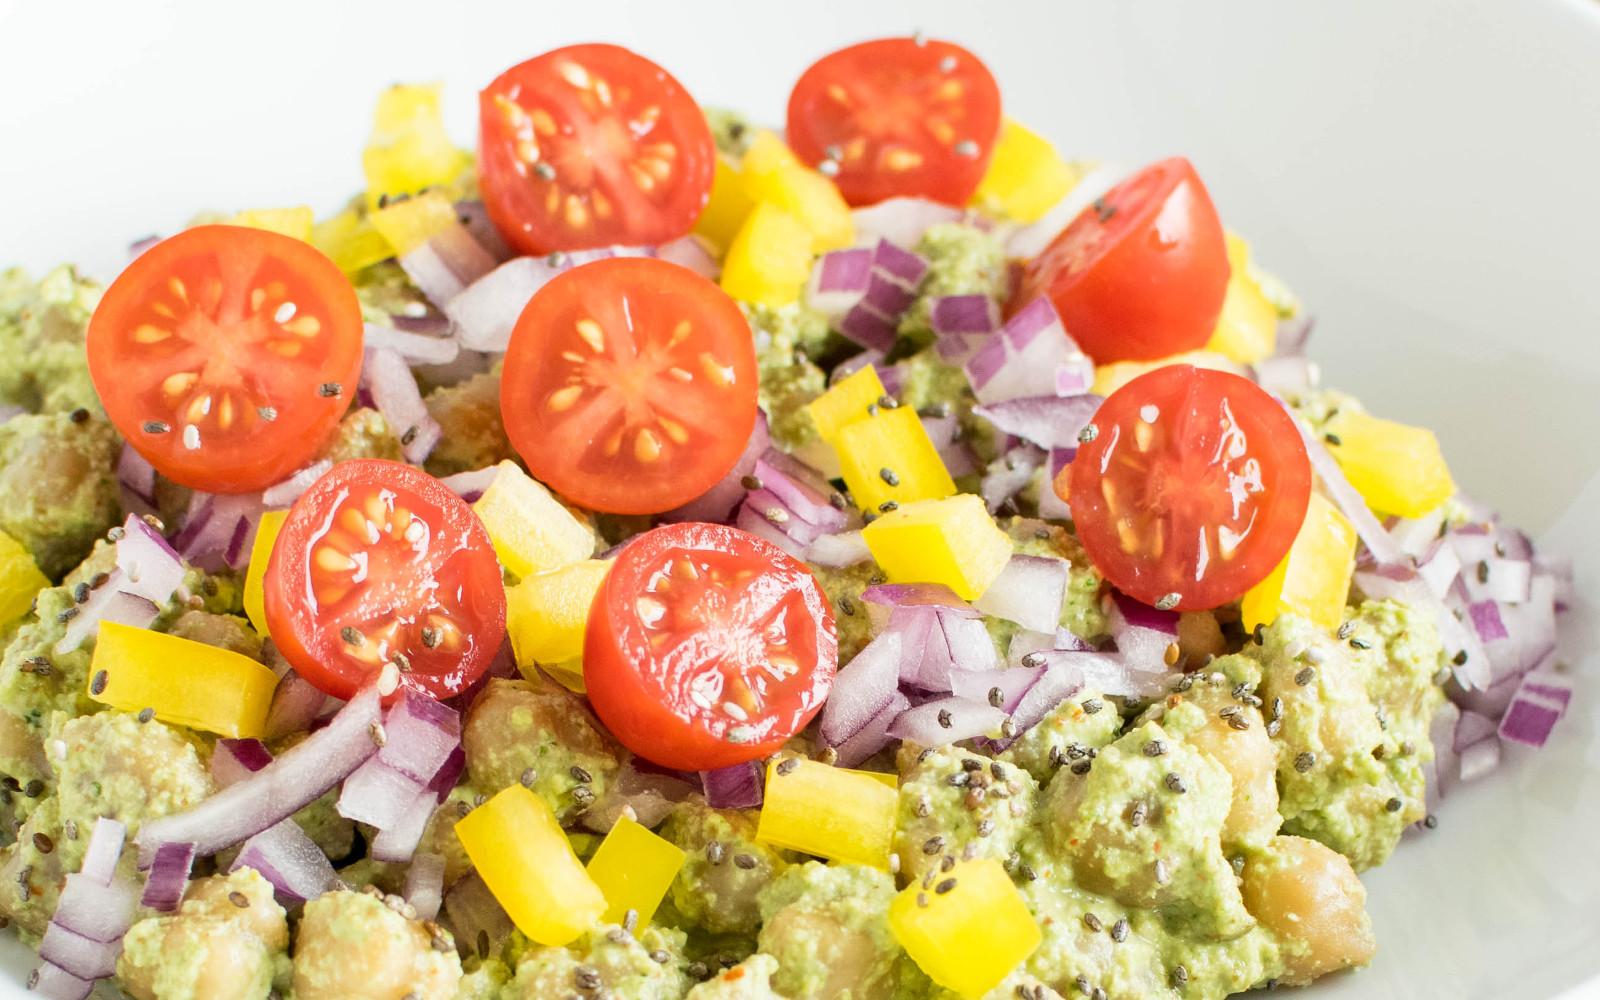 Chickpea Salad With Cilantro Dressing